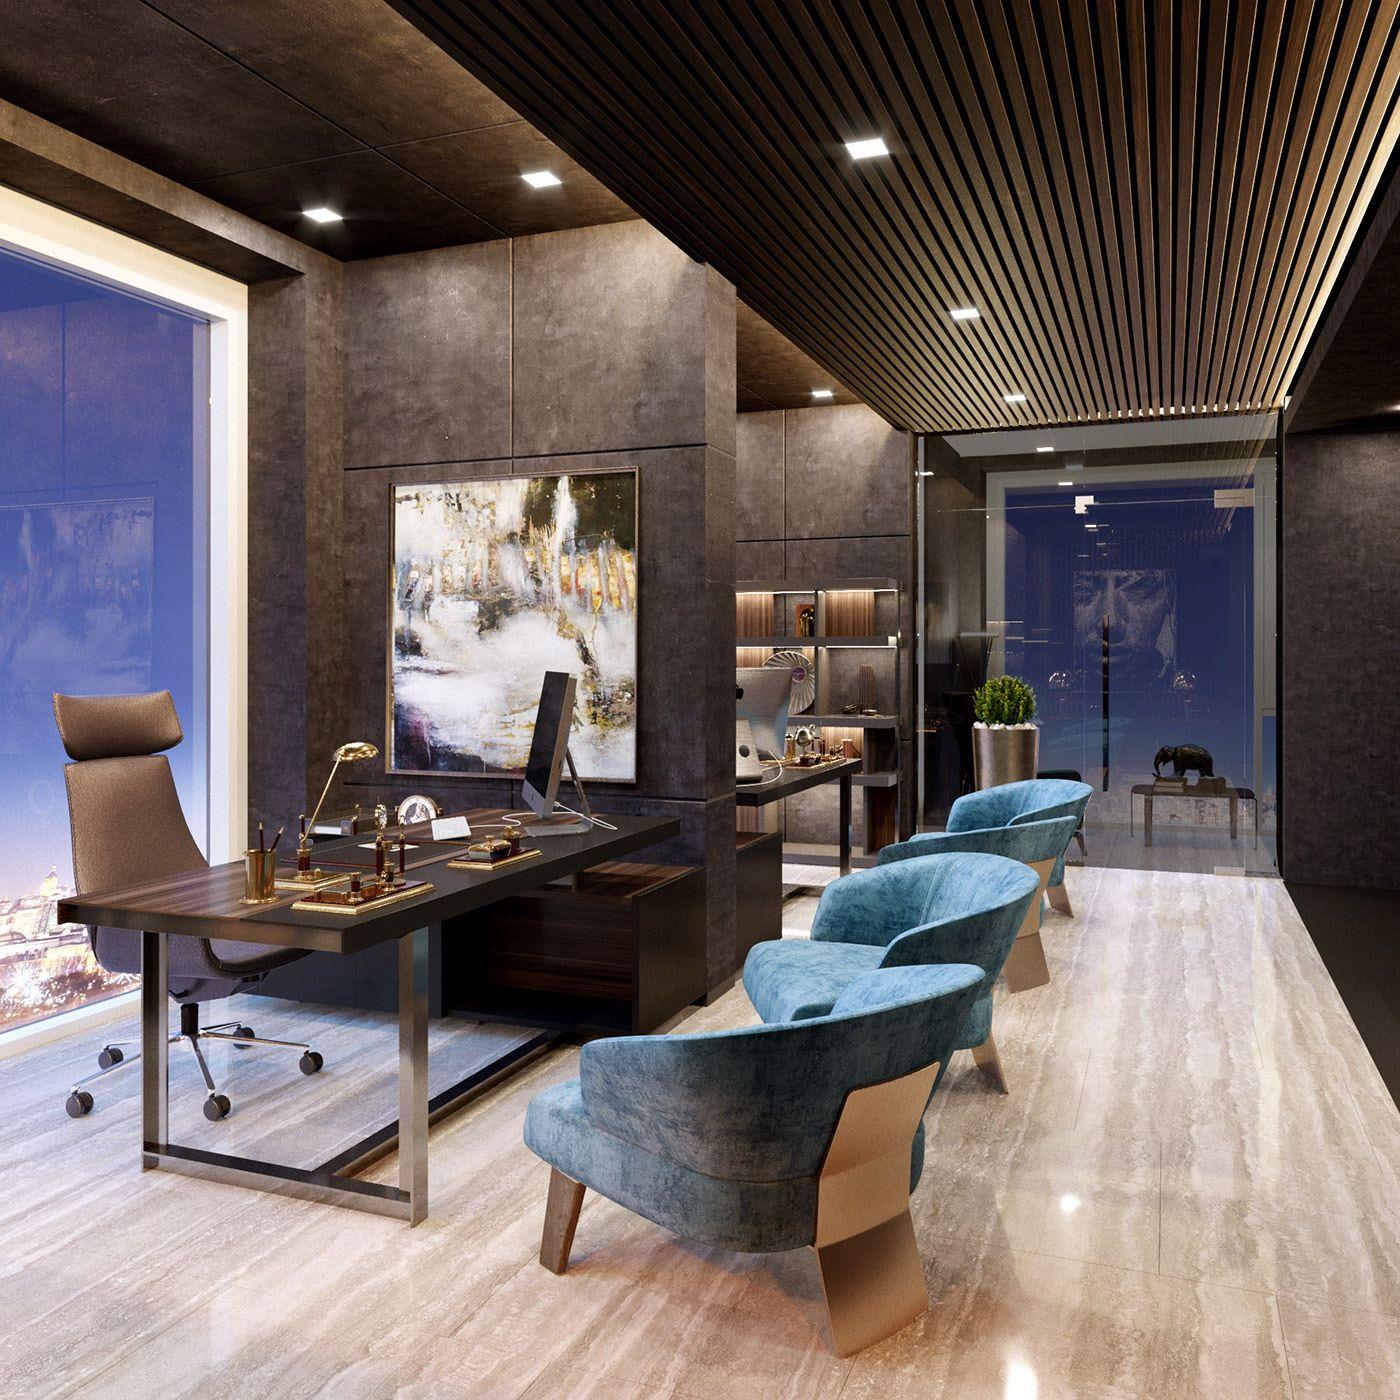 Office concept on Behance | Office interior design ...